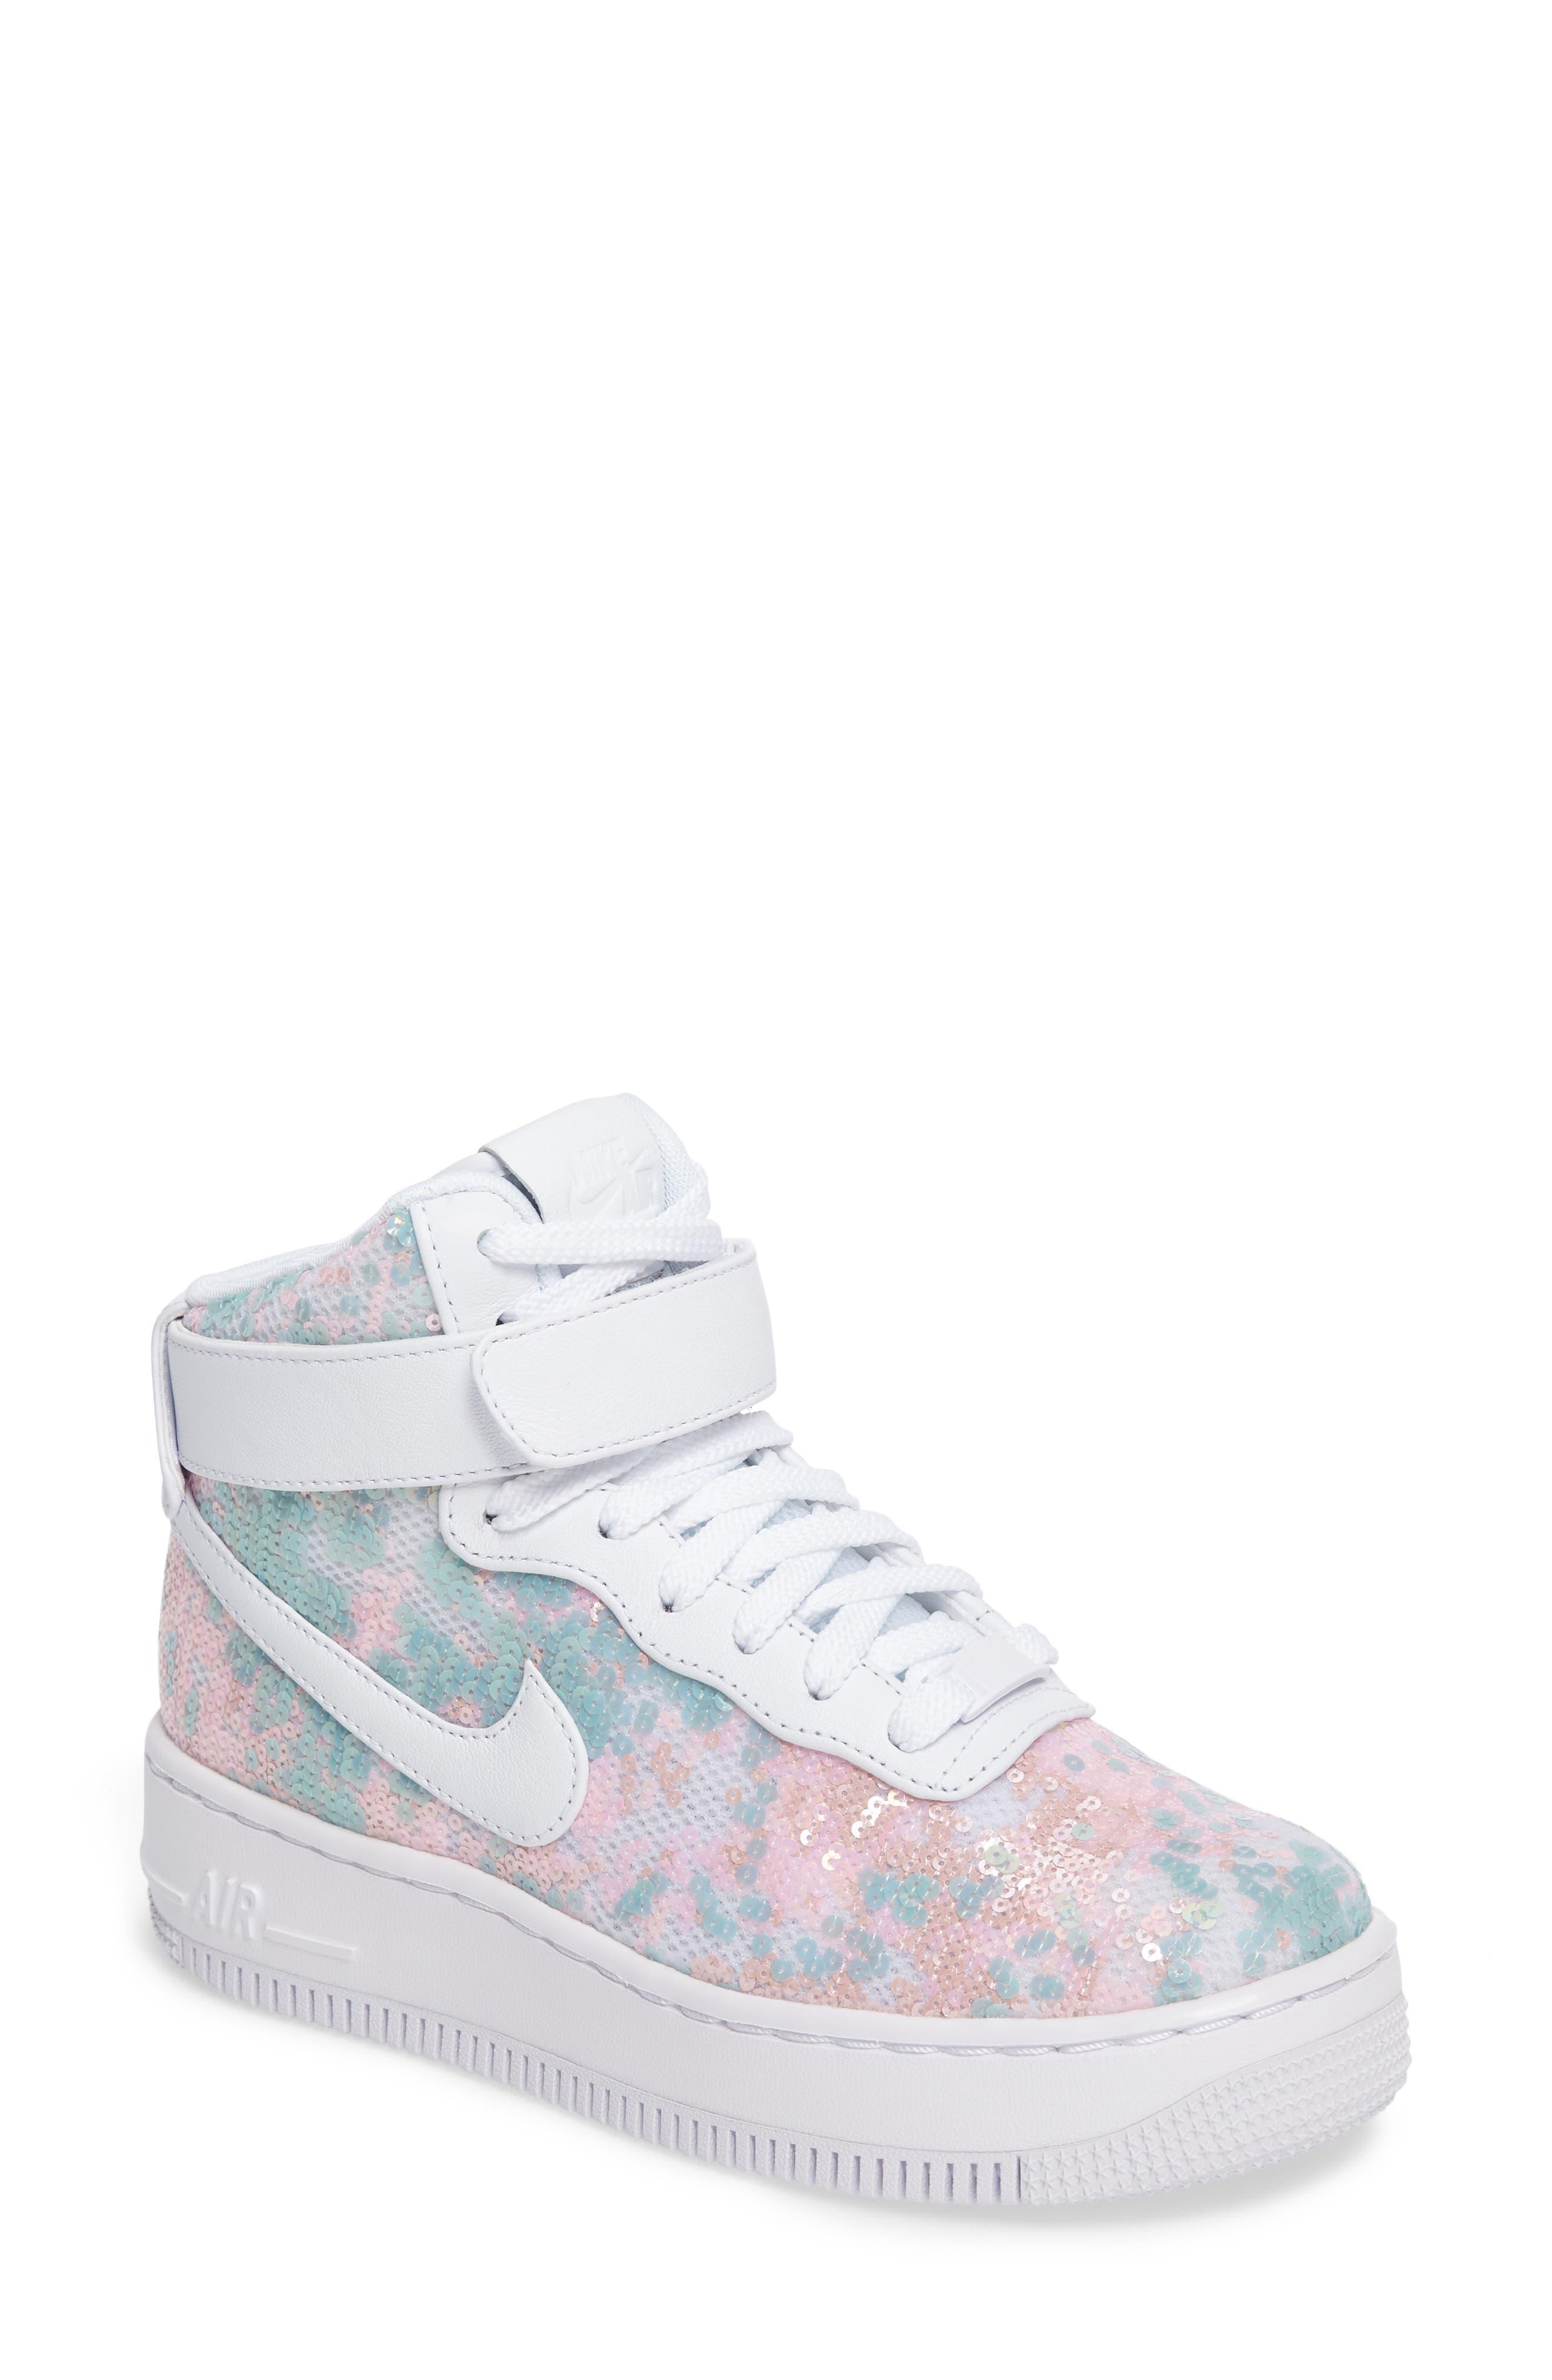 Nike Air Force 1 Upstep Hi LX Sequined High Top Sneaker (Women)